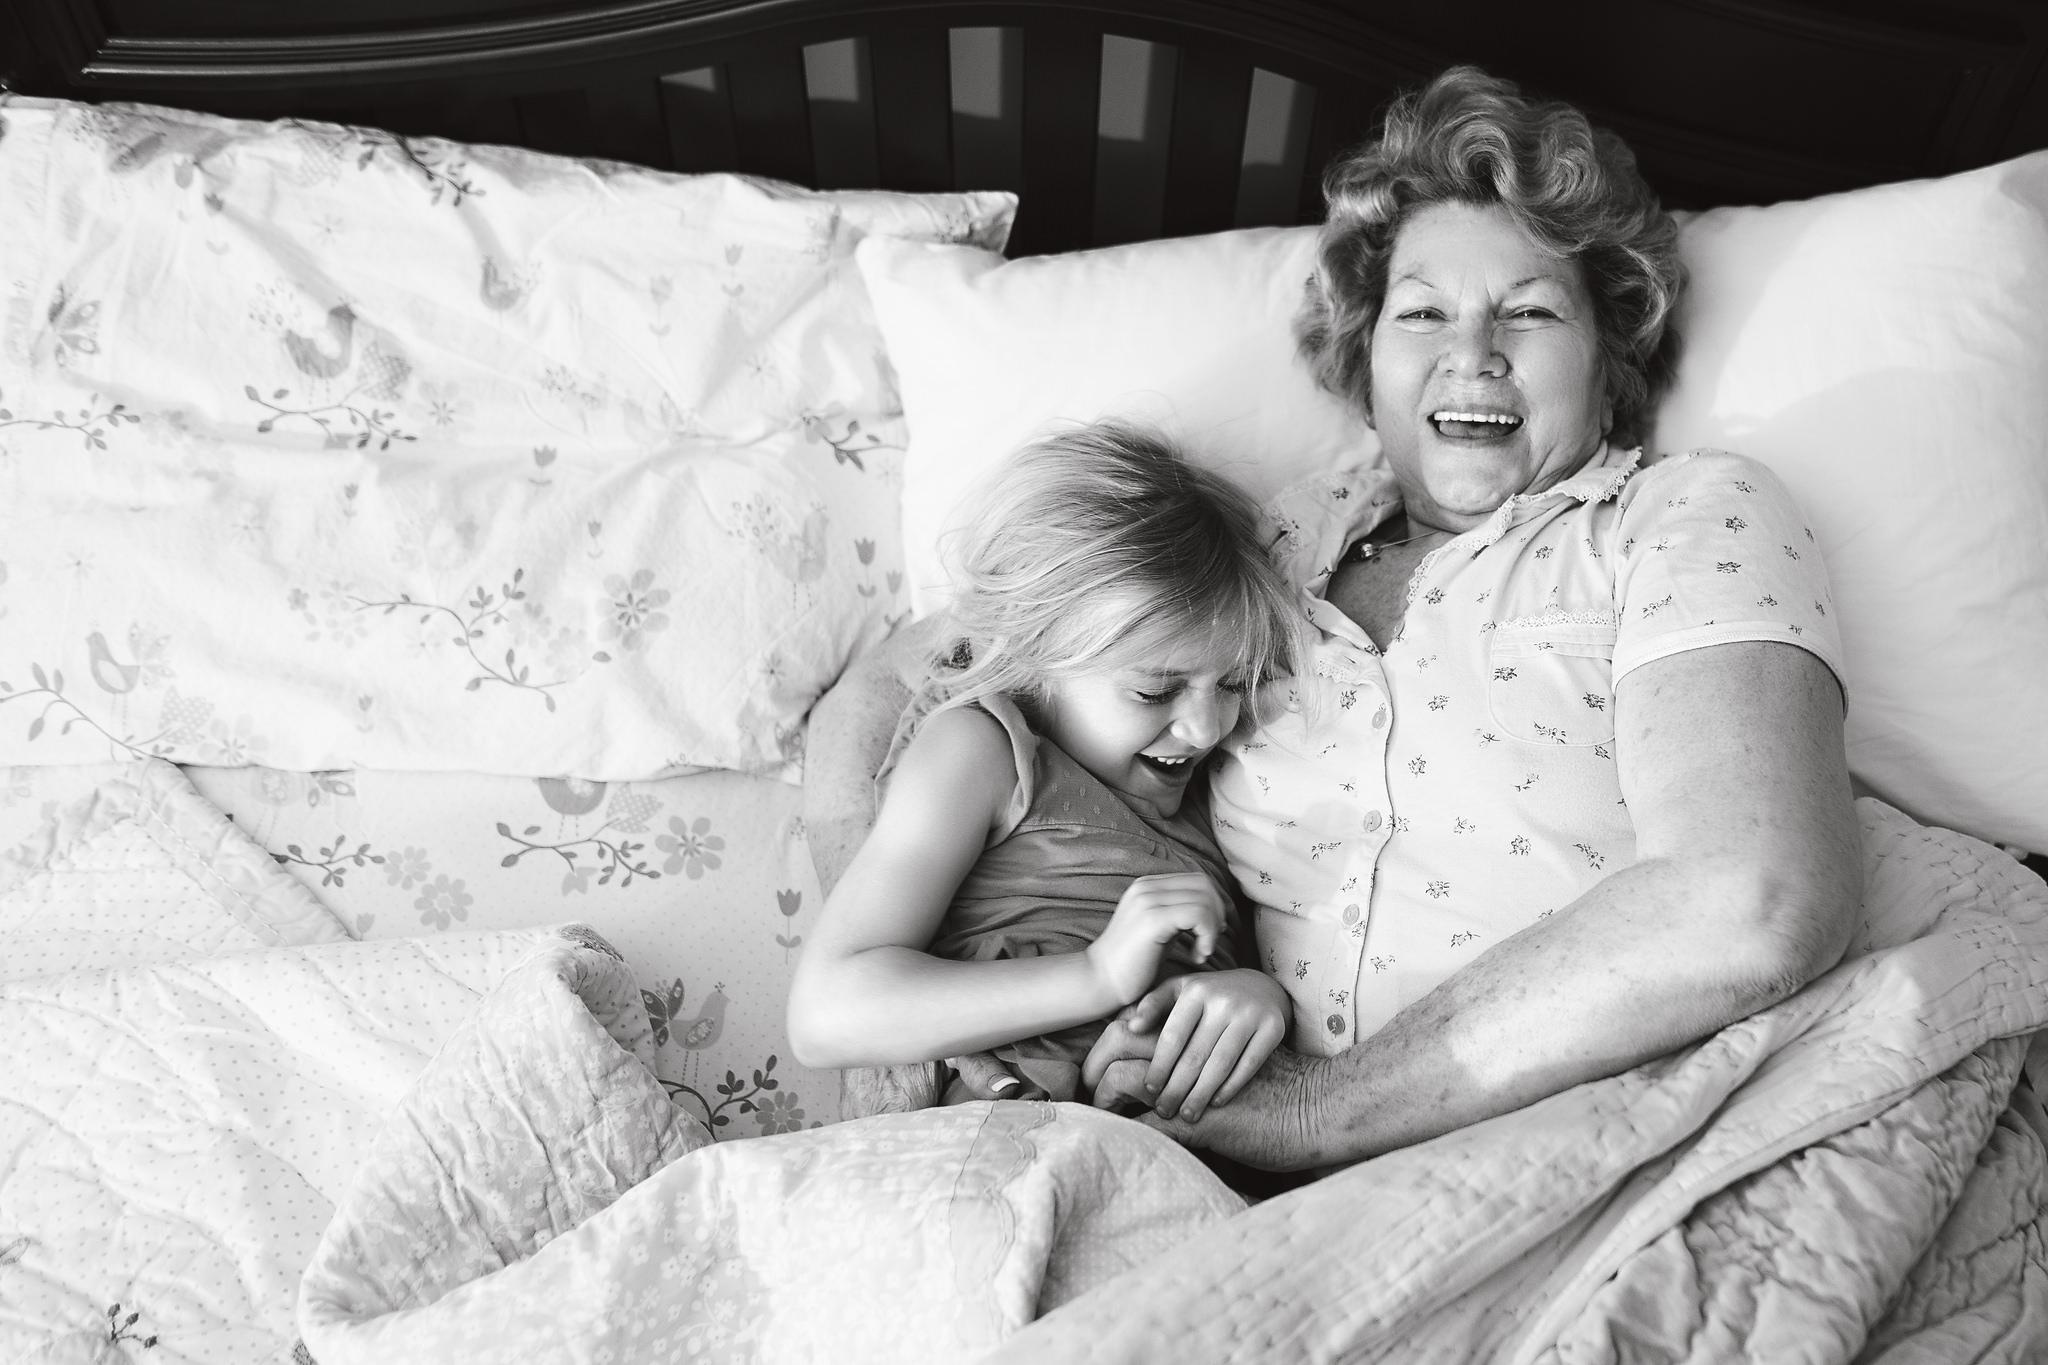 hello-olivia-photography-family-photojournalism-365-tutorial-documenting-bedtime-rituals-lowlight-kids-documentary-and lifestyle-photographer-long-island-new-york4.jpg